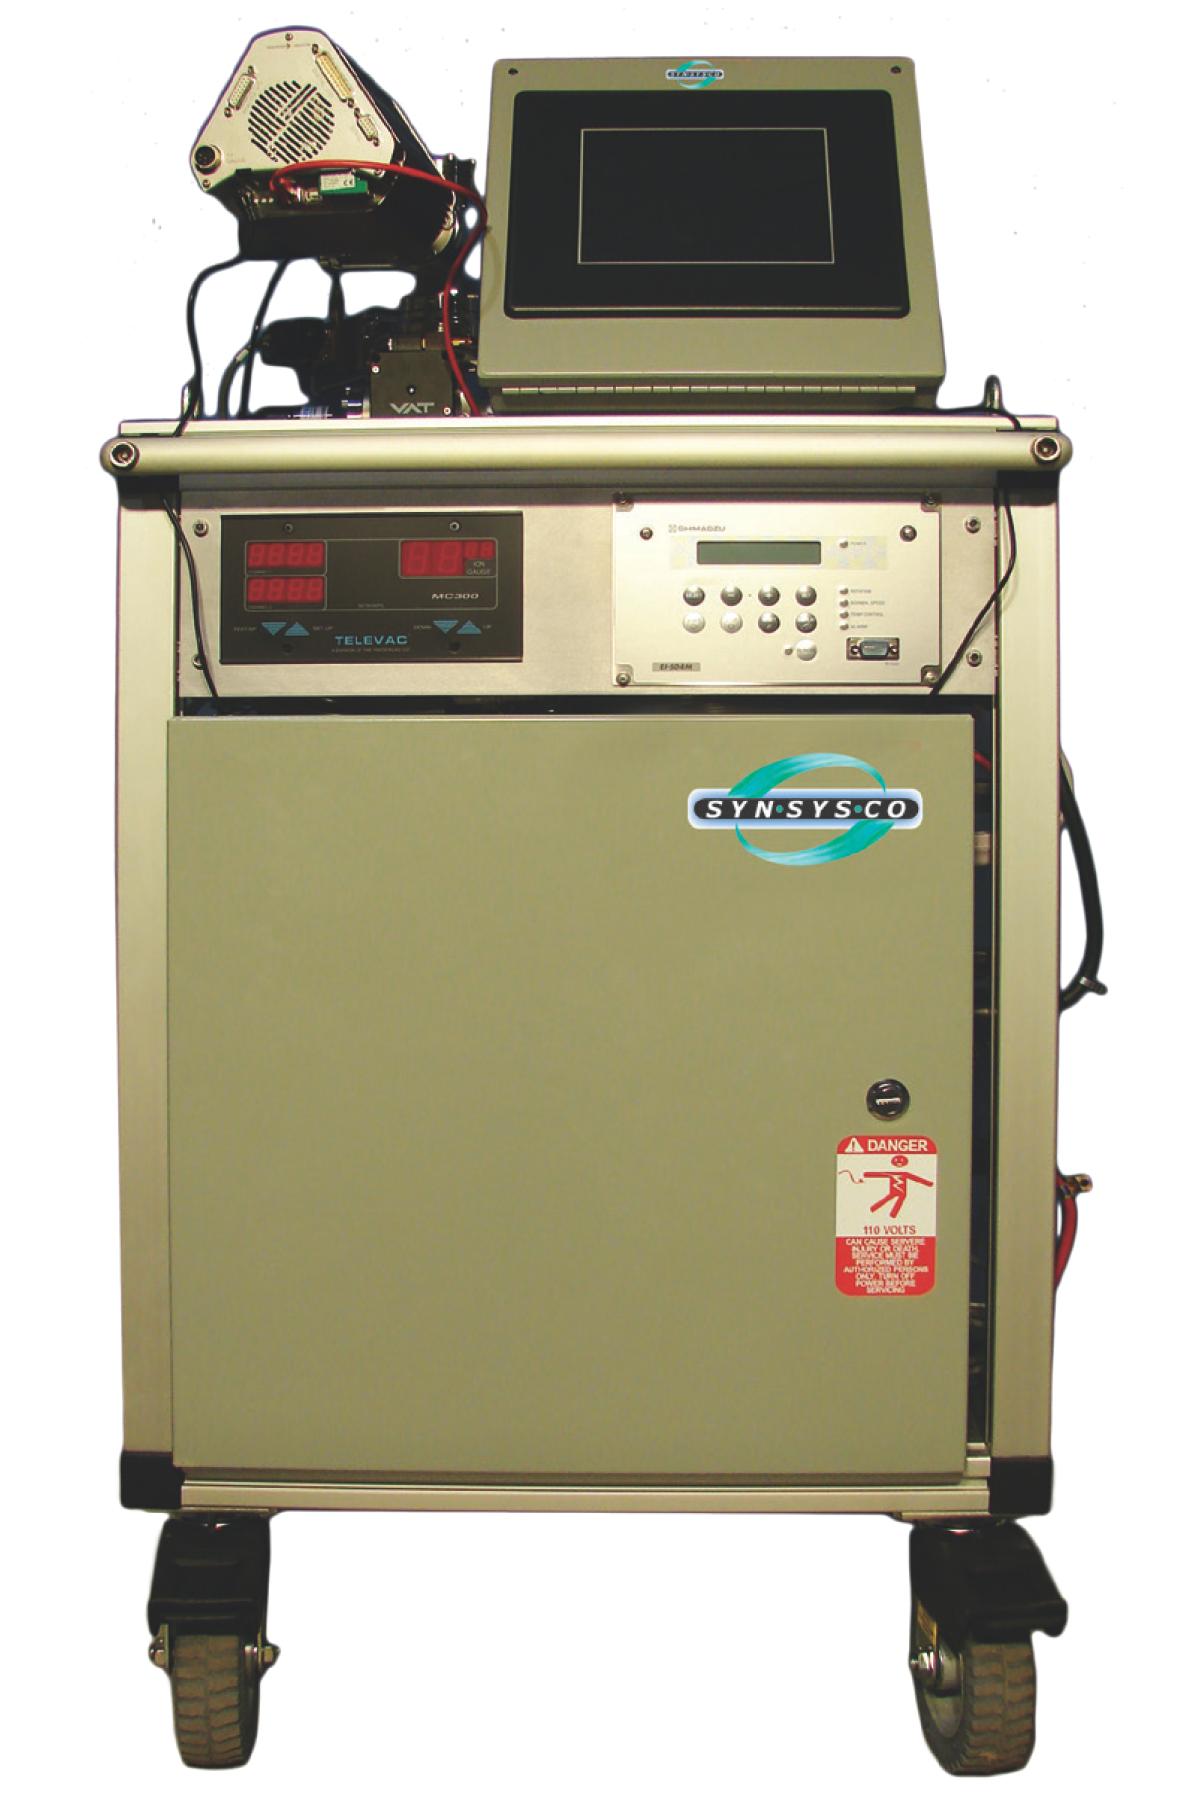 SVR-50 Residual Gas Analyzer